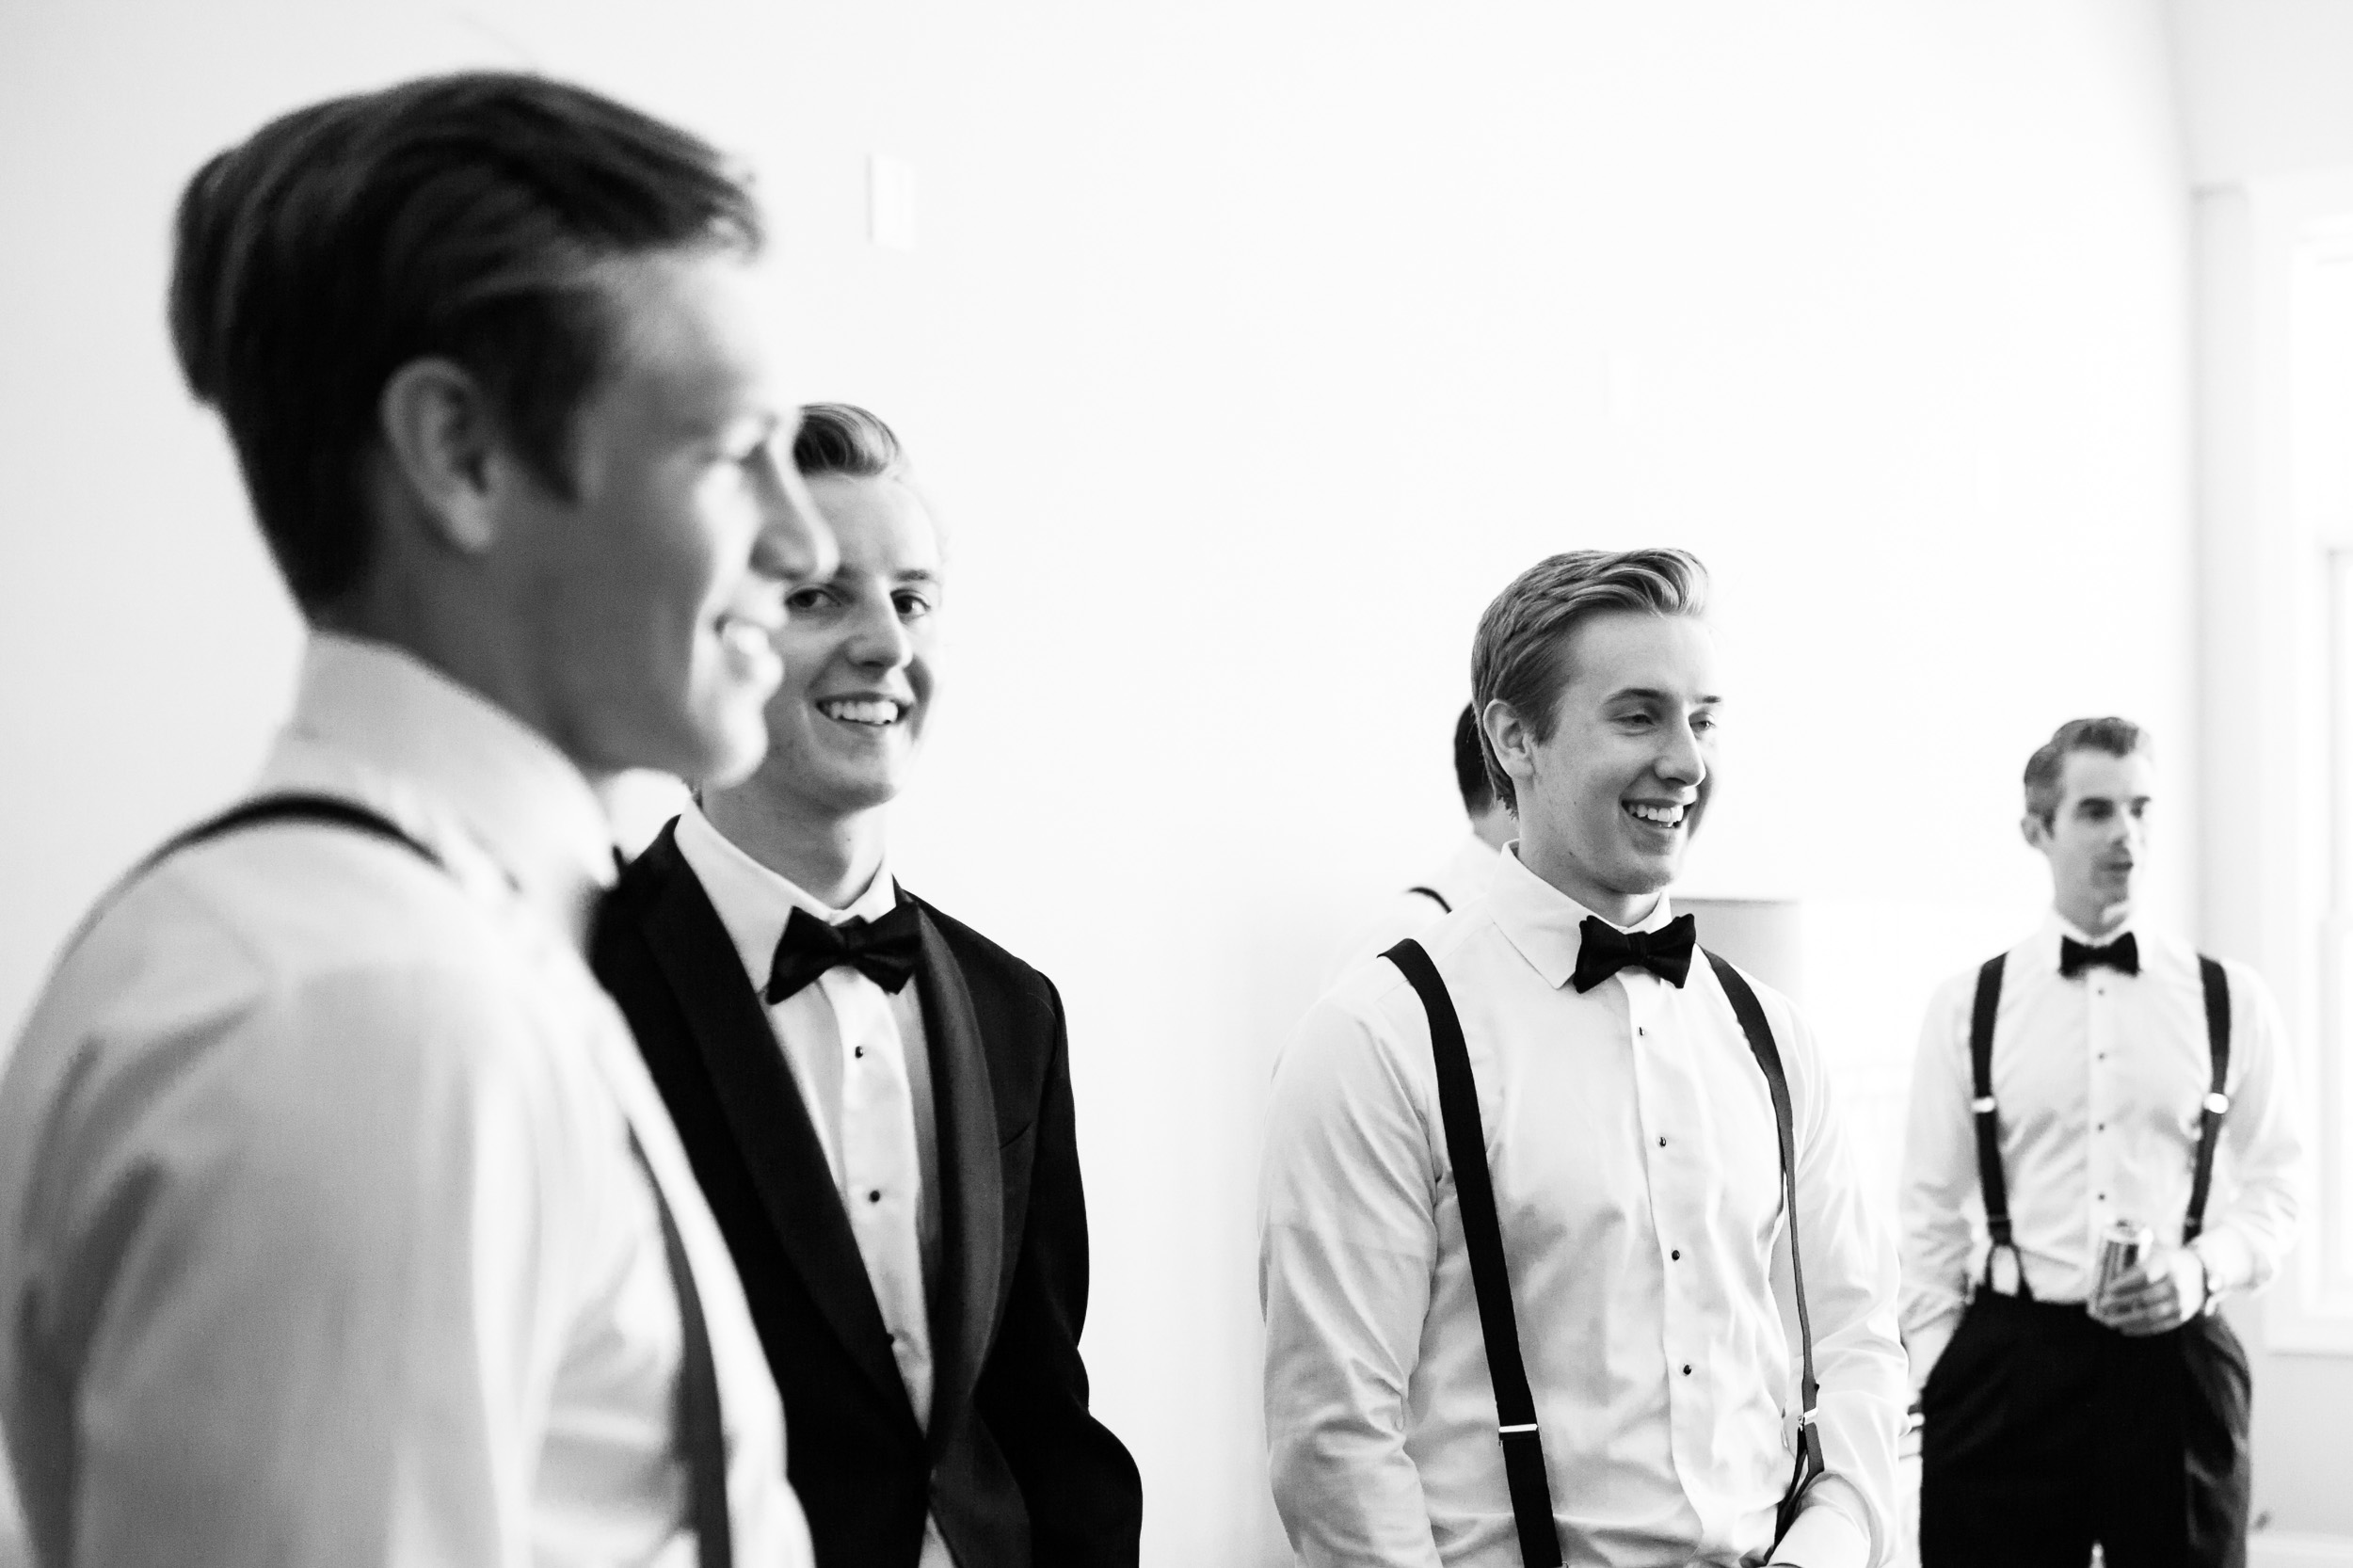 chicago-illuminating-co-wedding-photos-3.jpg